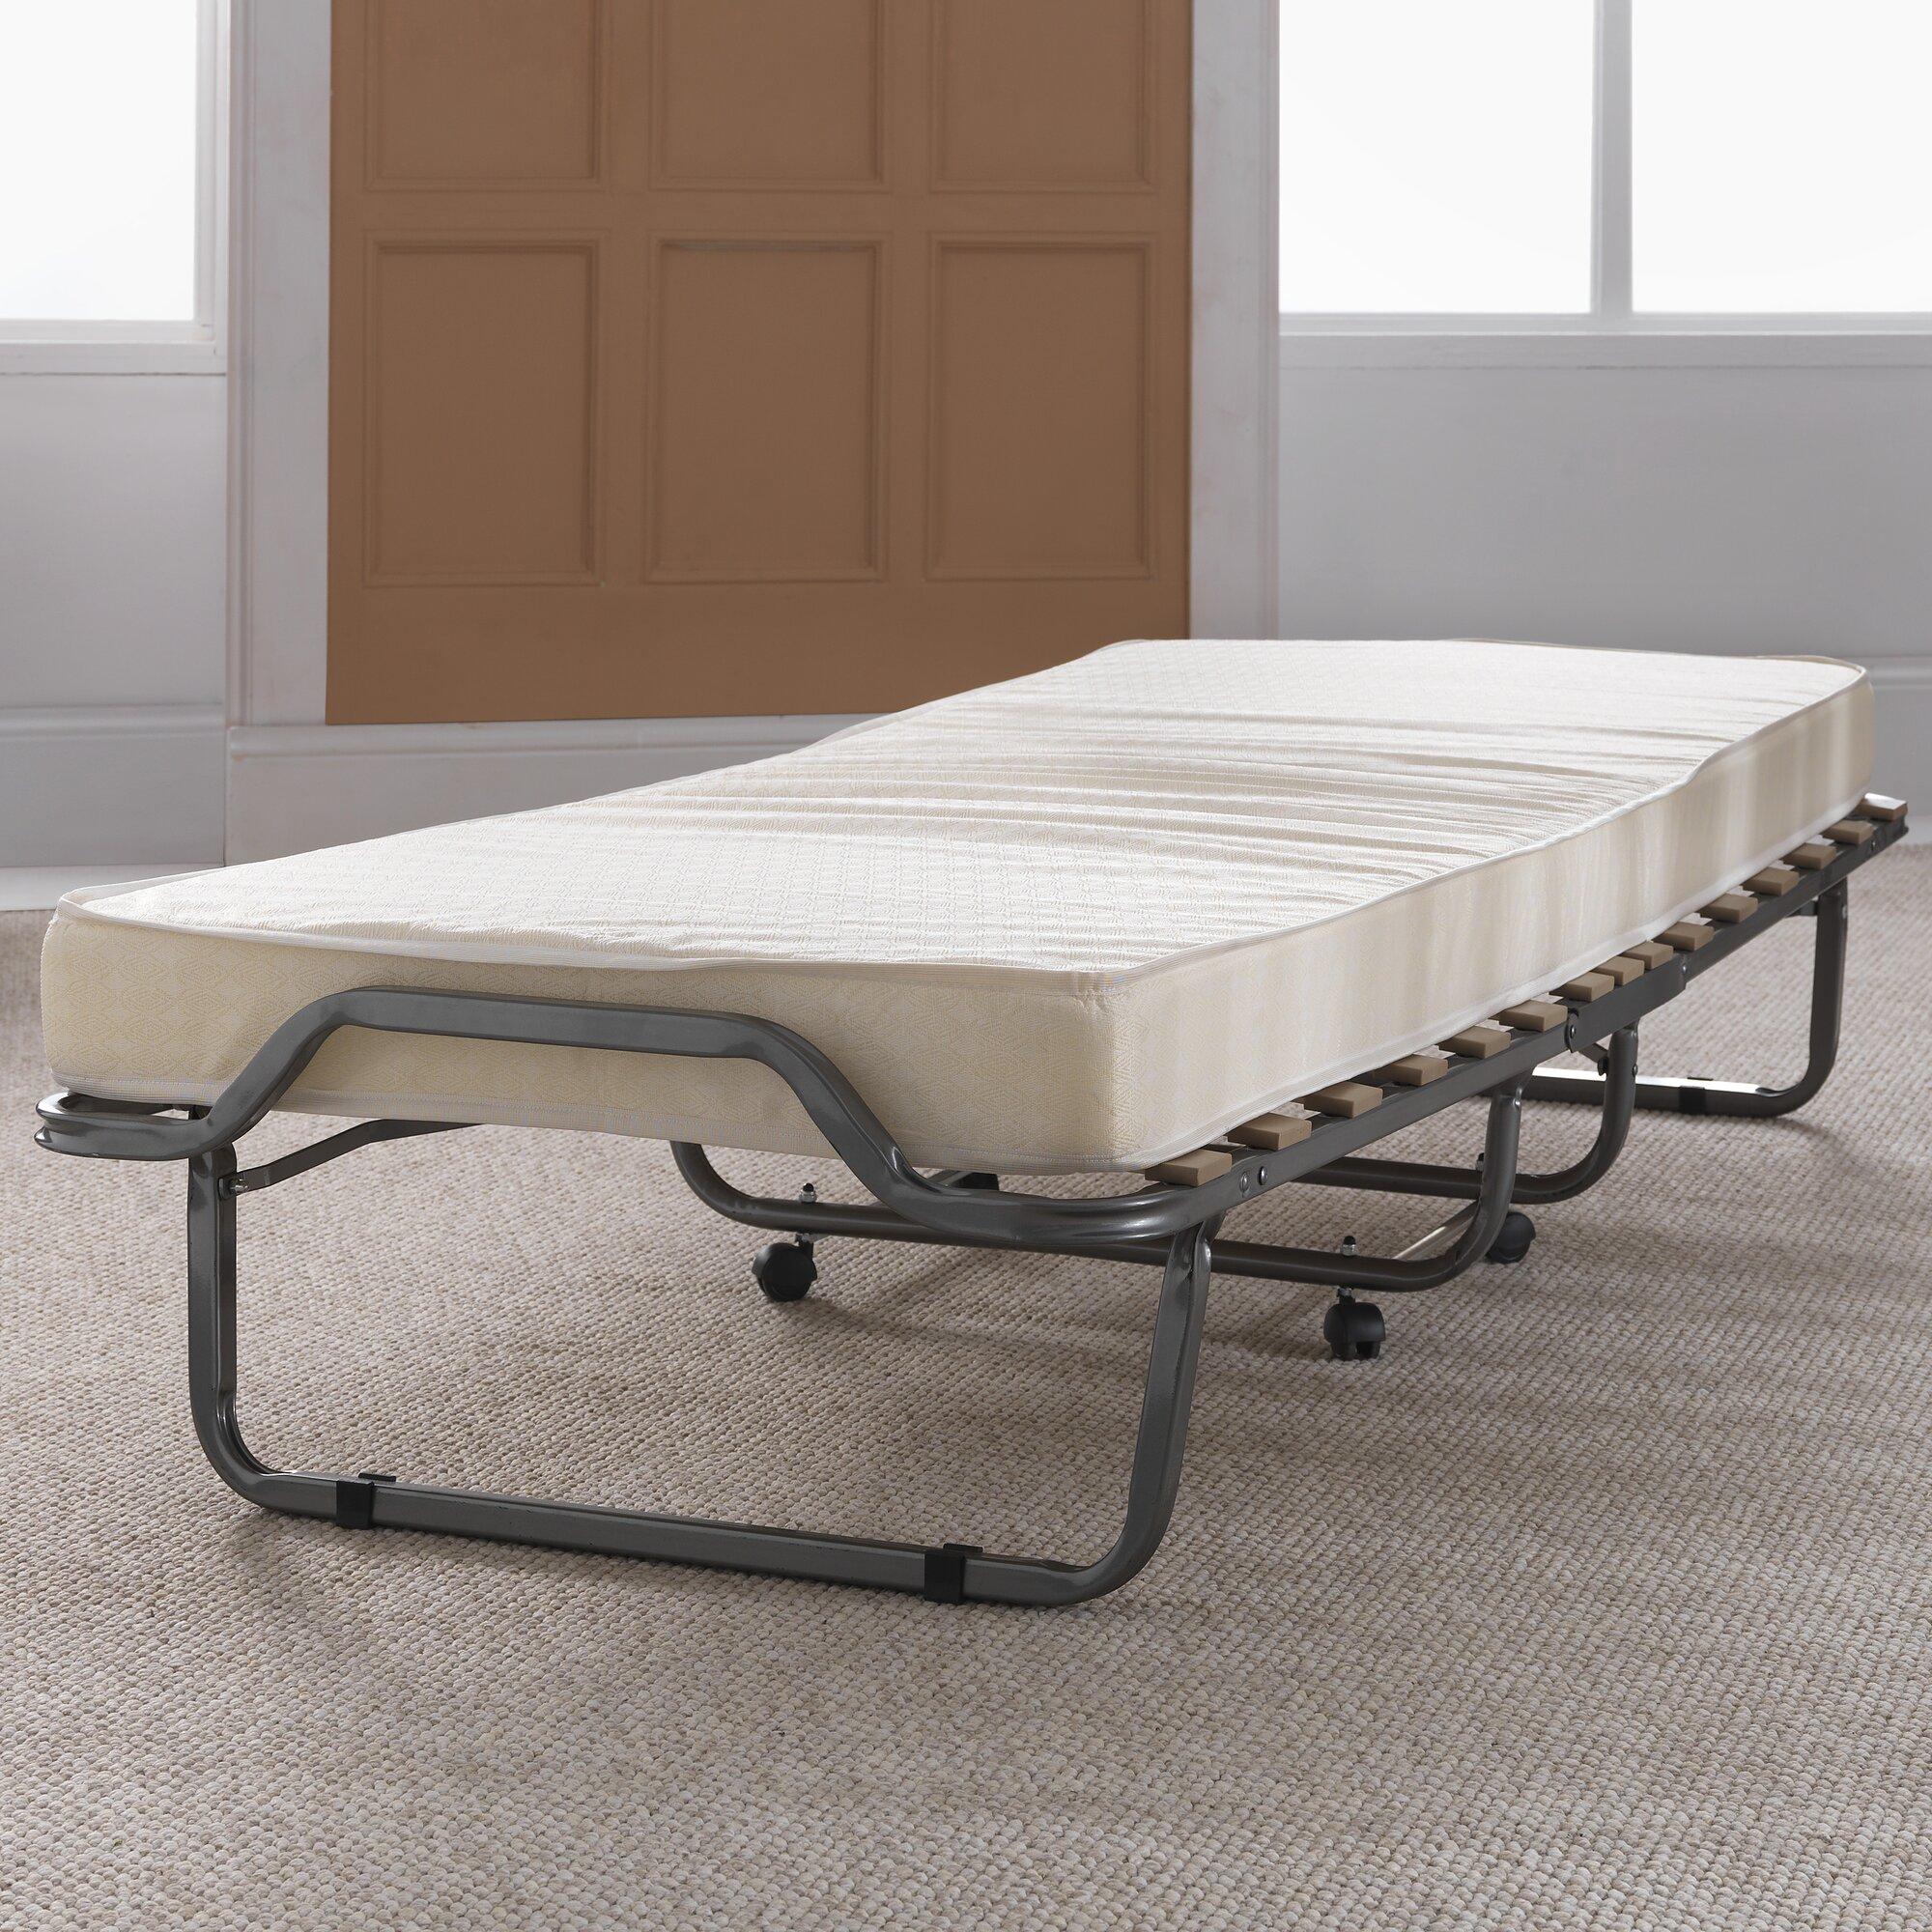 Folding Beds Reviews : Home haus luxor folding bed reviews wayfair